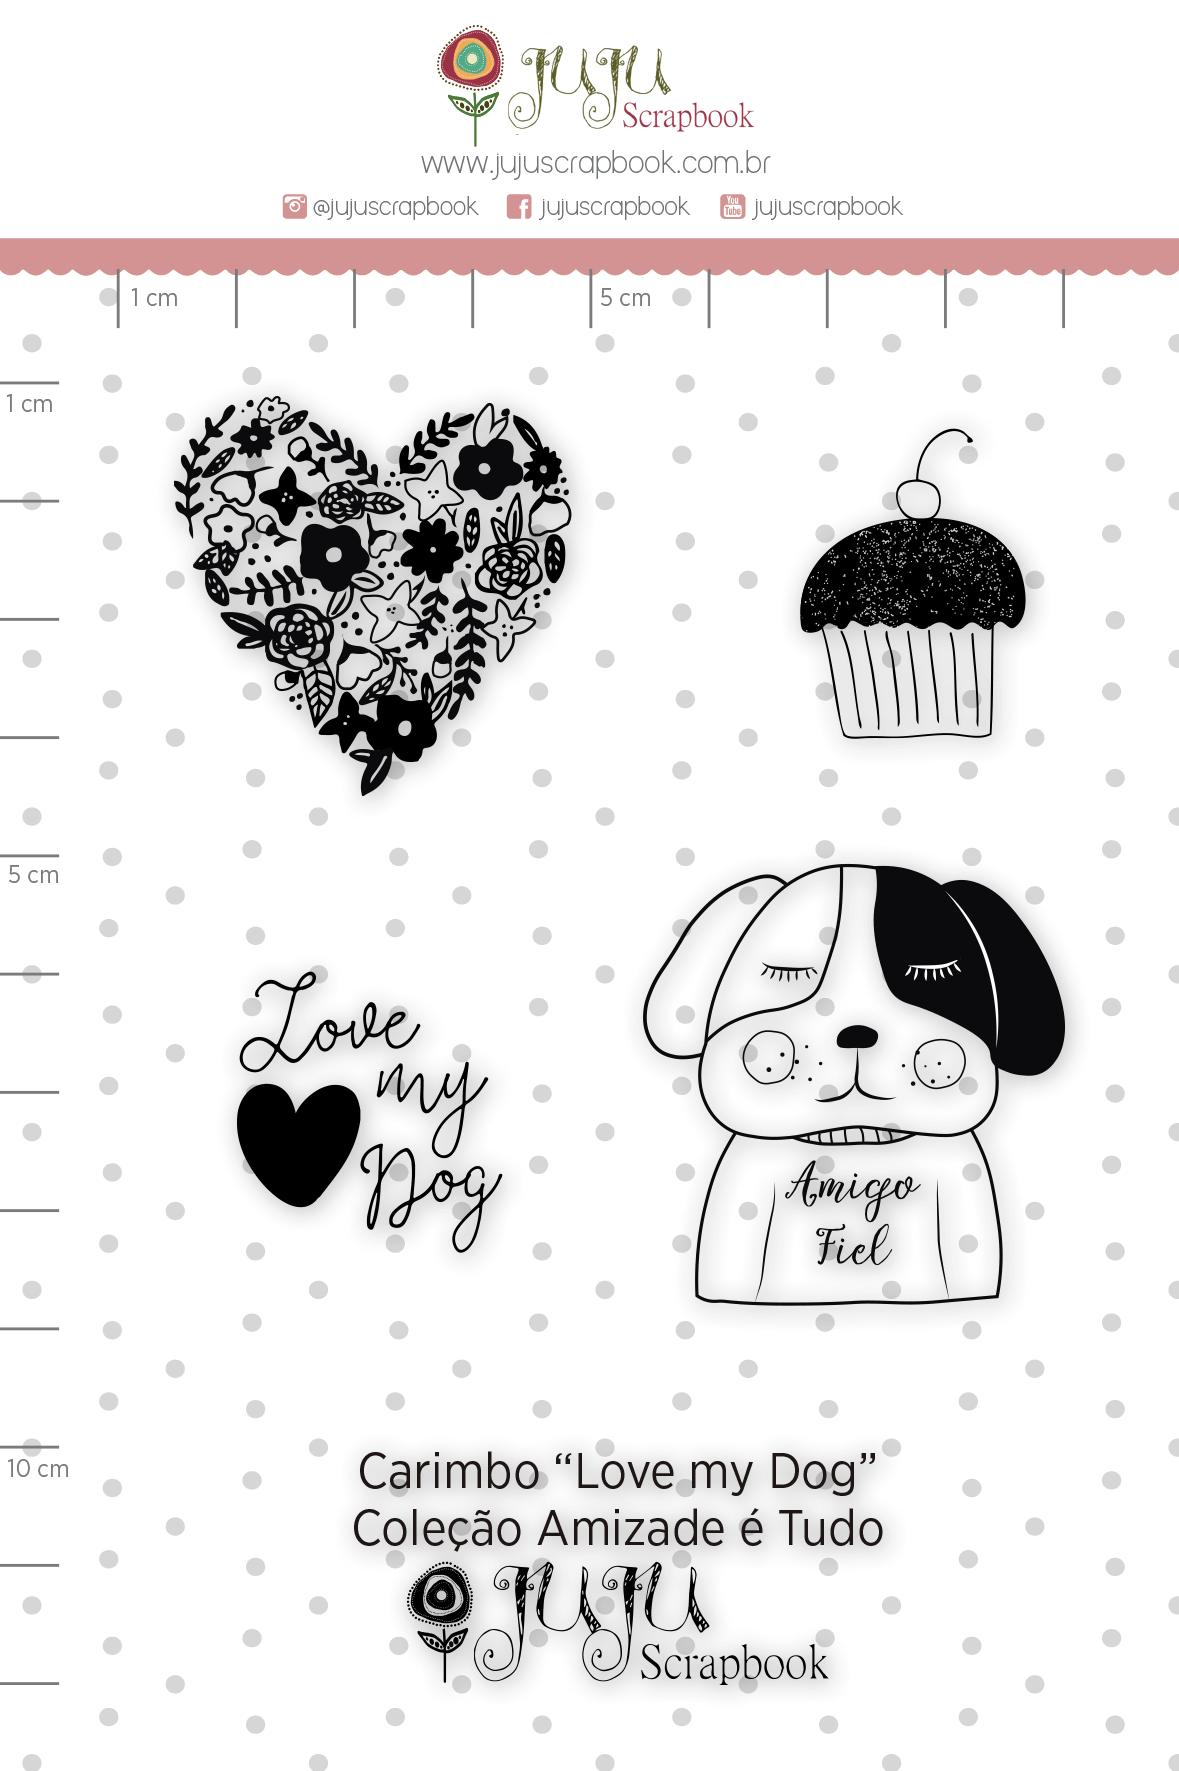 Carimbo G Love my Dog - Coleção Amizade é Tudo - JuJu Scrapbook  - JuJu Scrapbook